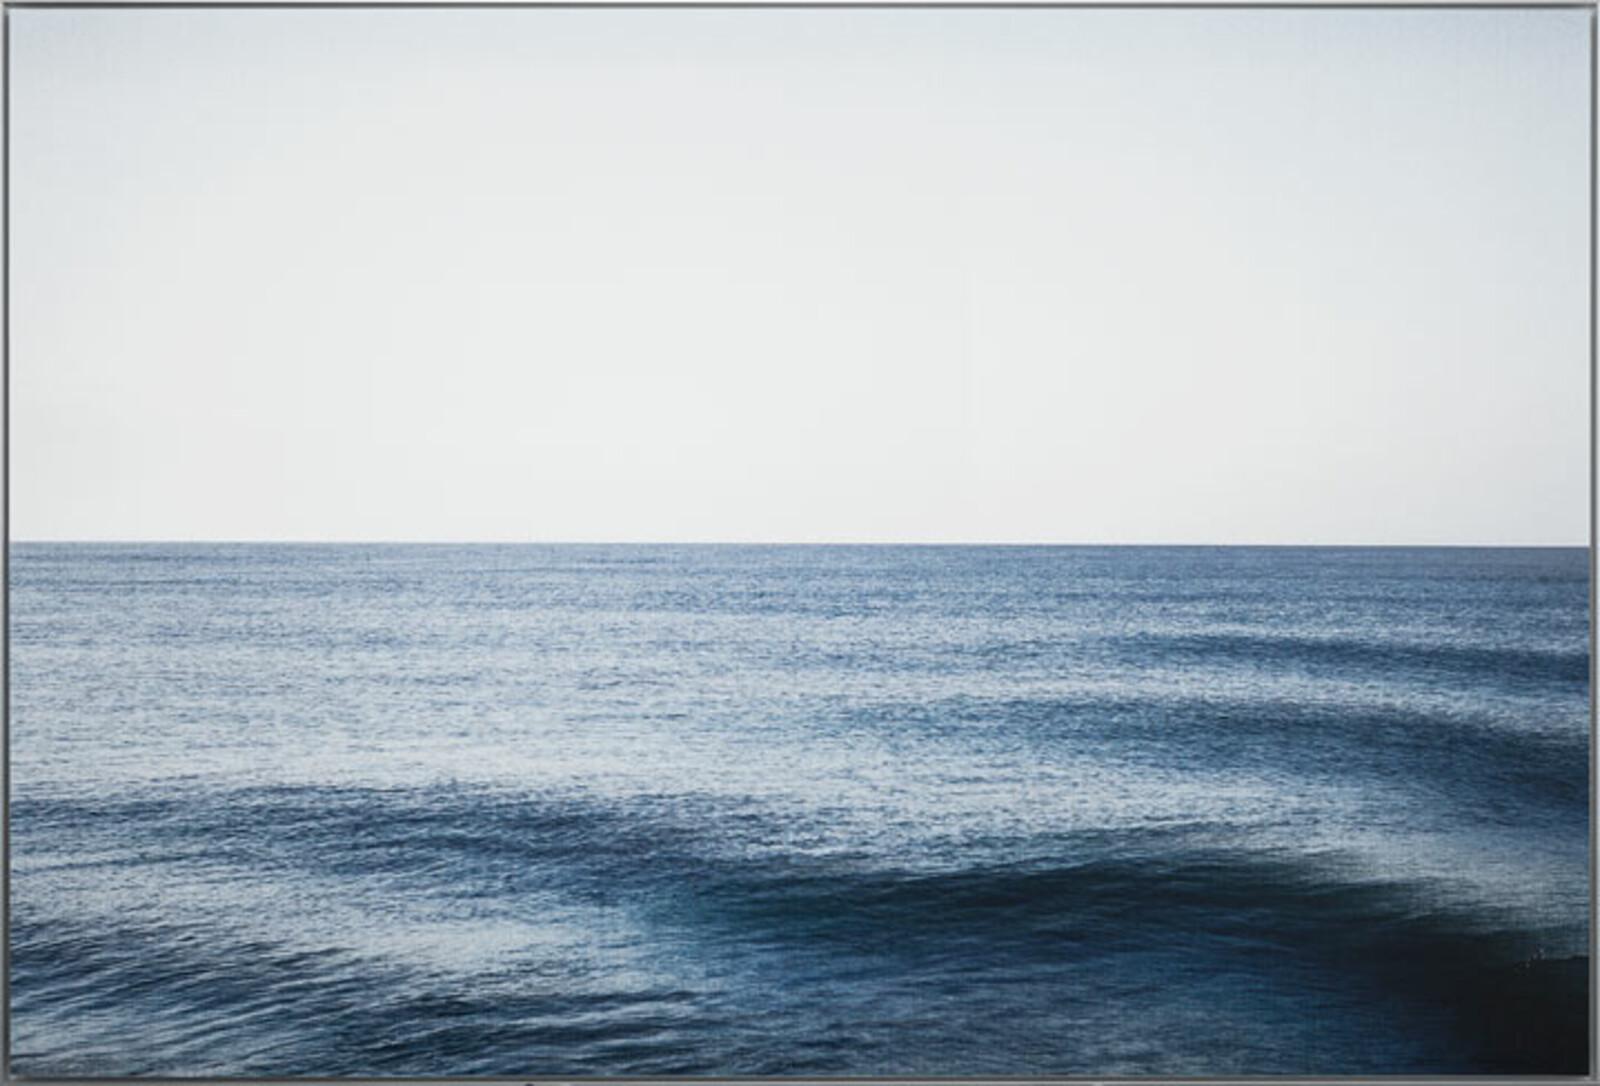 Seesaw Seascape III - Wolfgang Uhlig